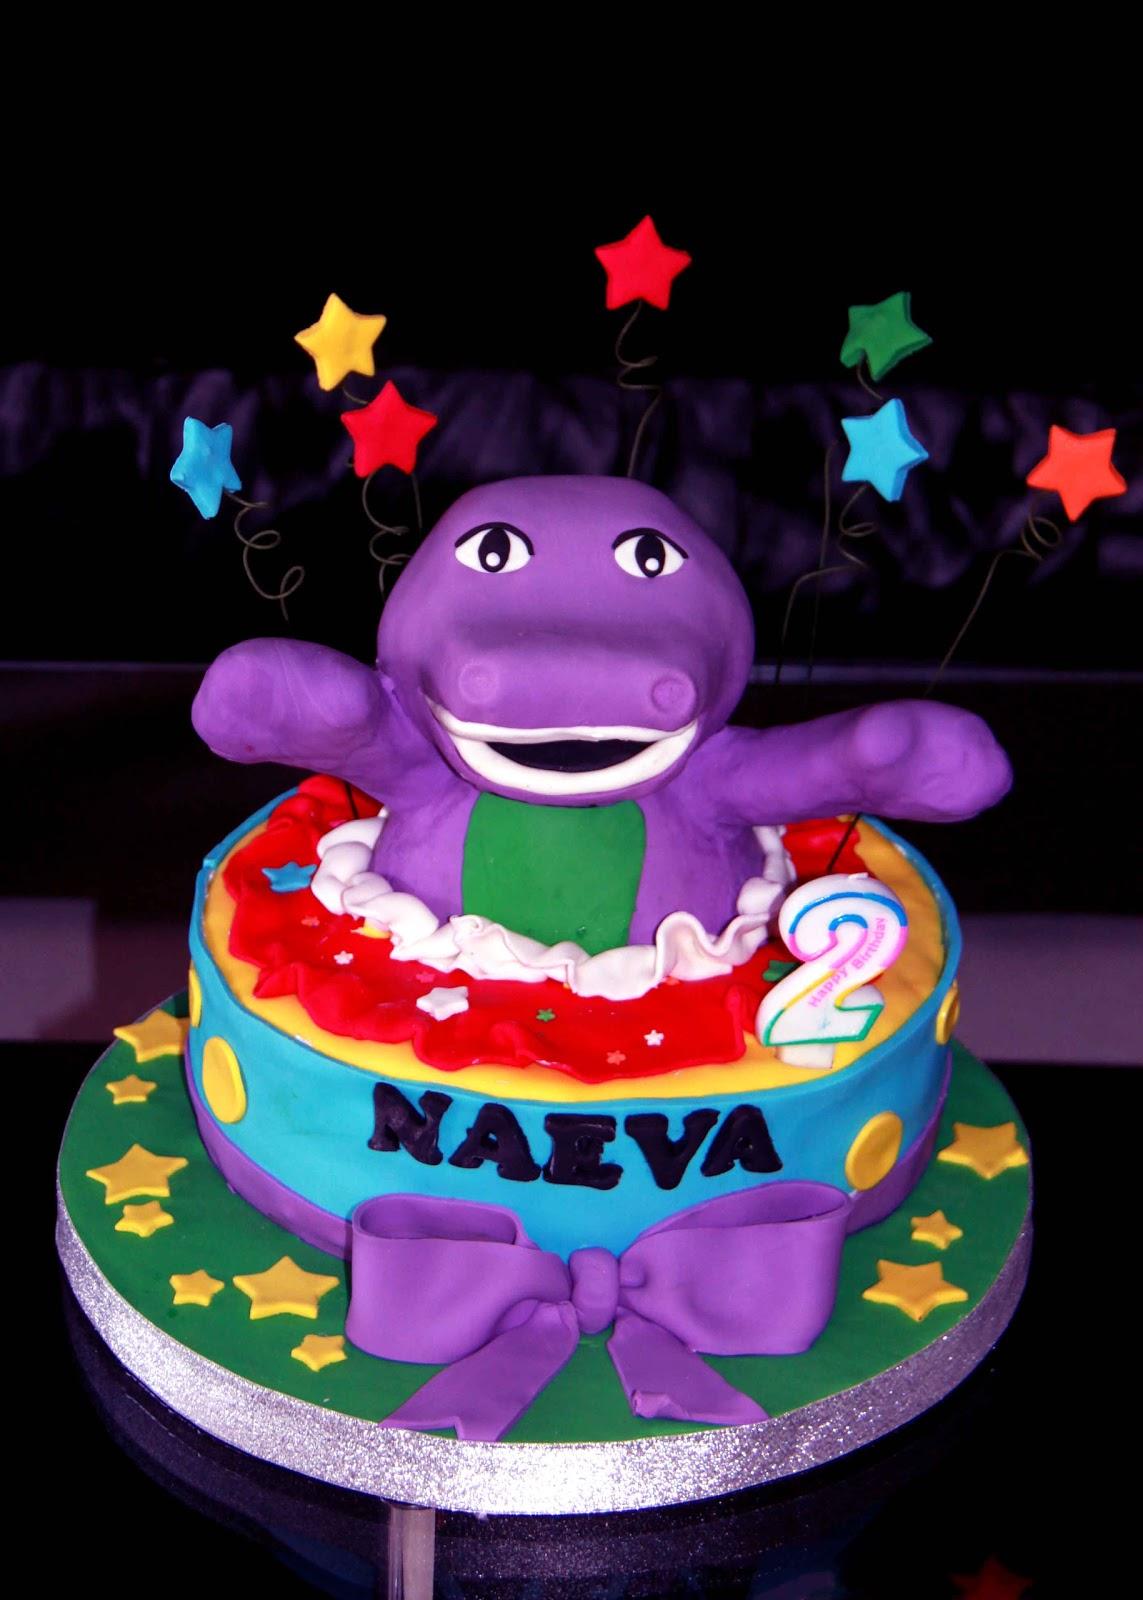 barney cake - photo #25